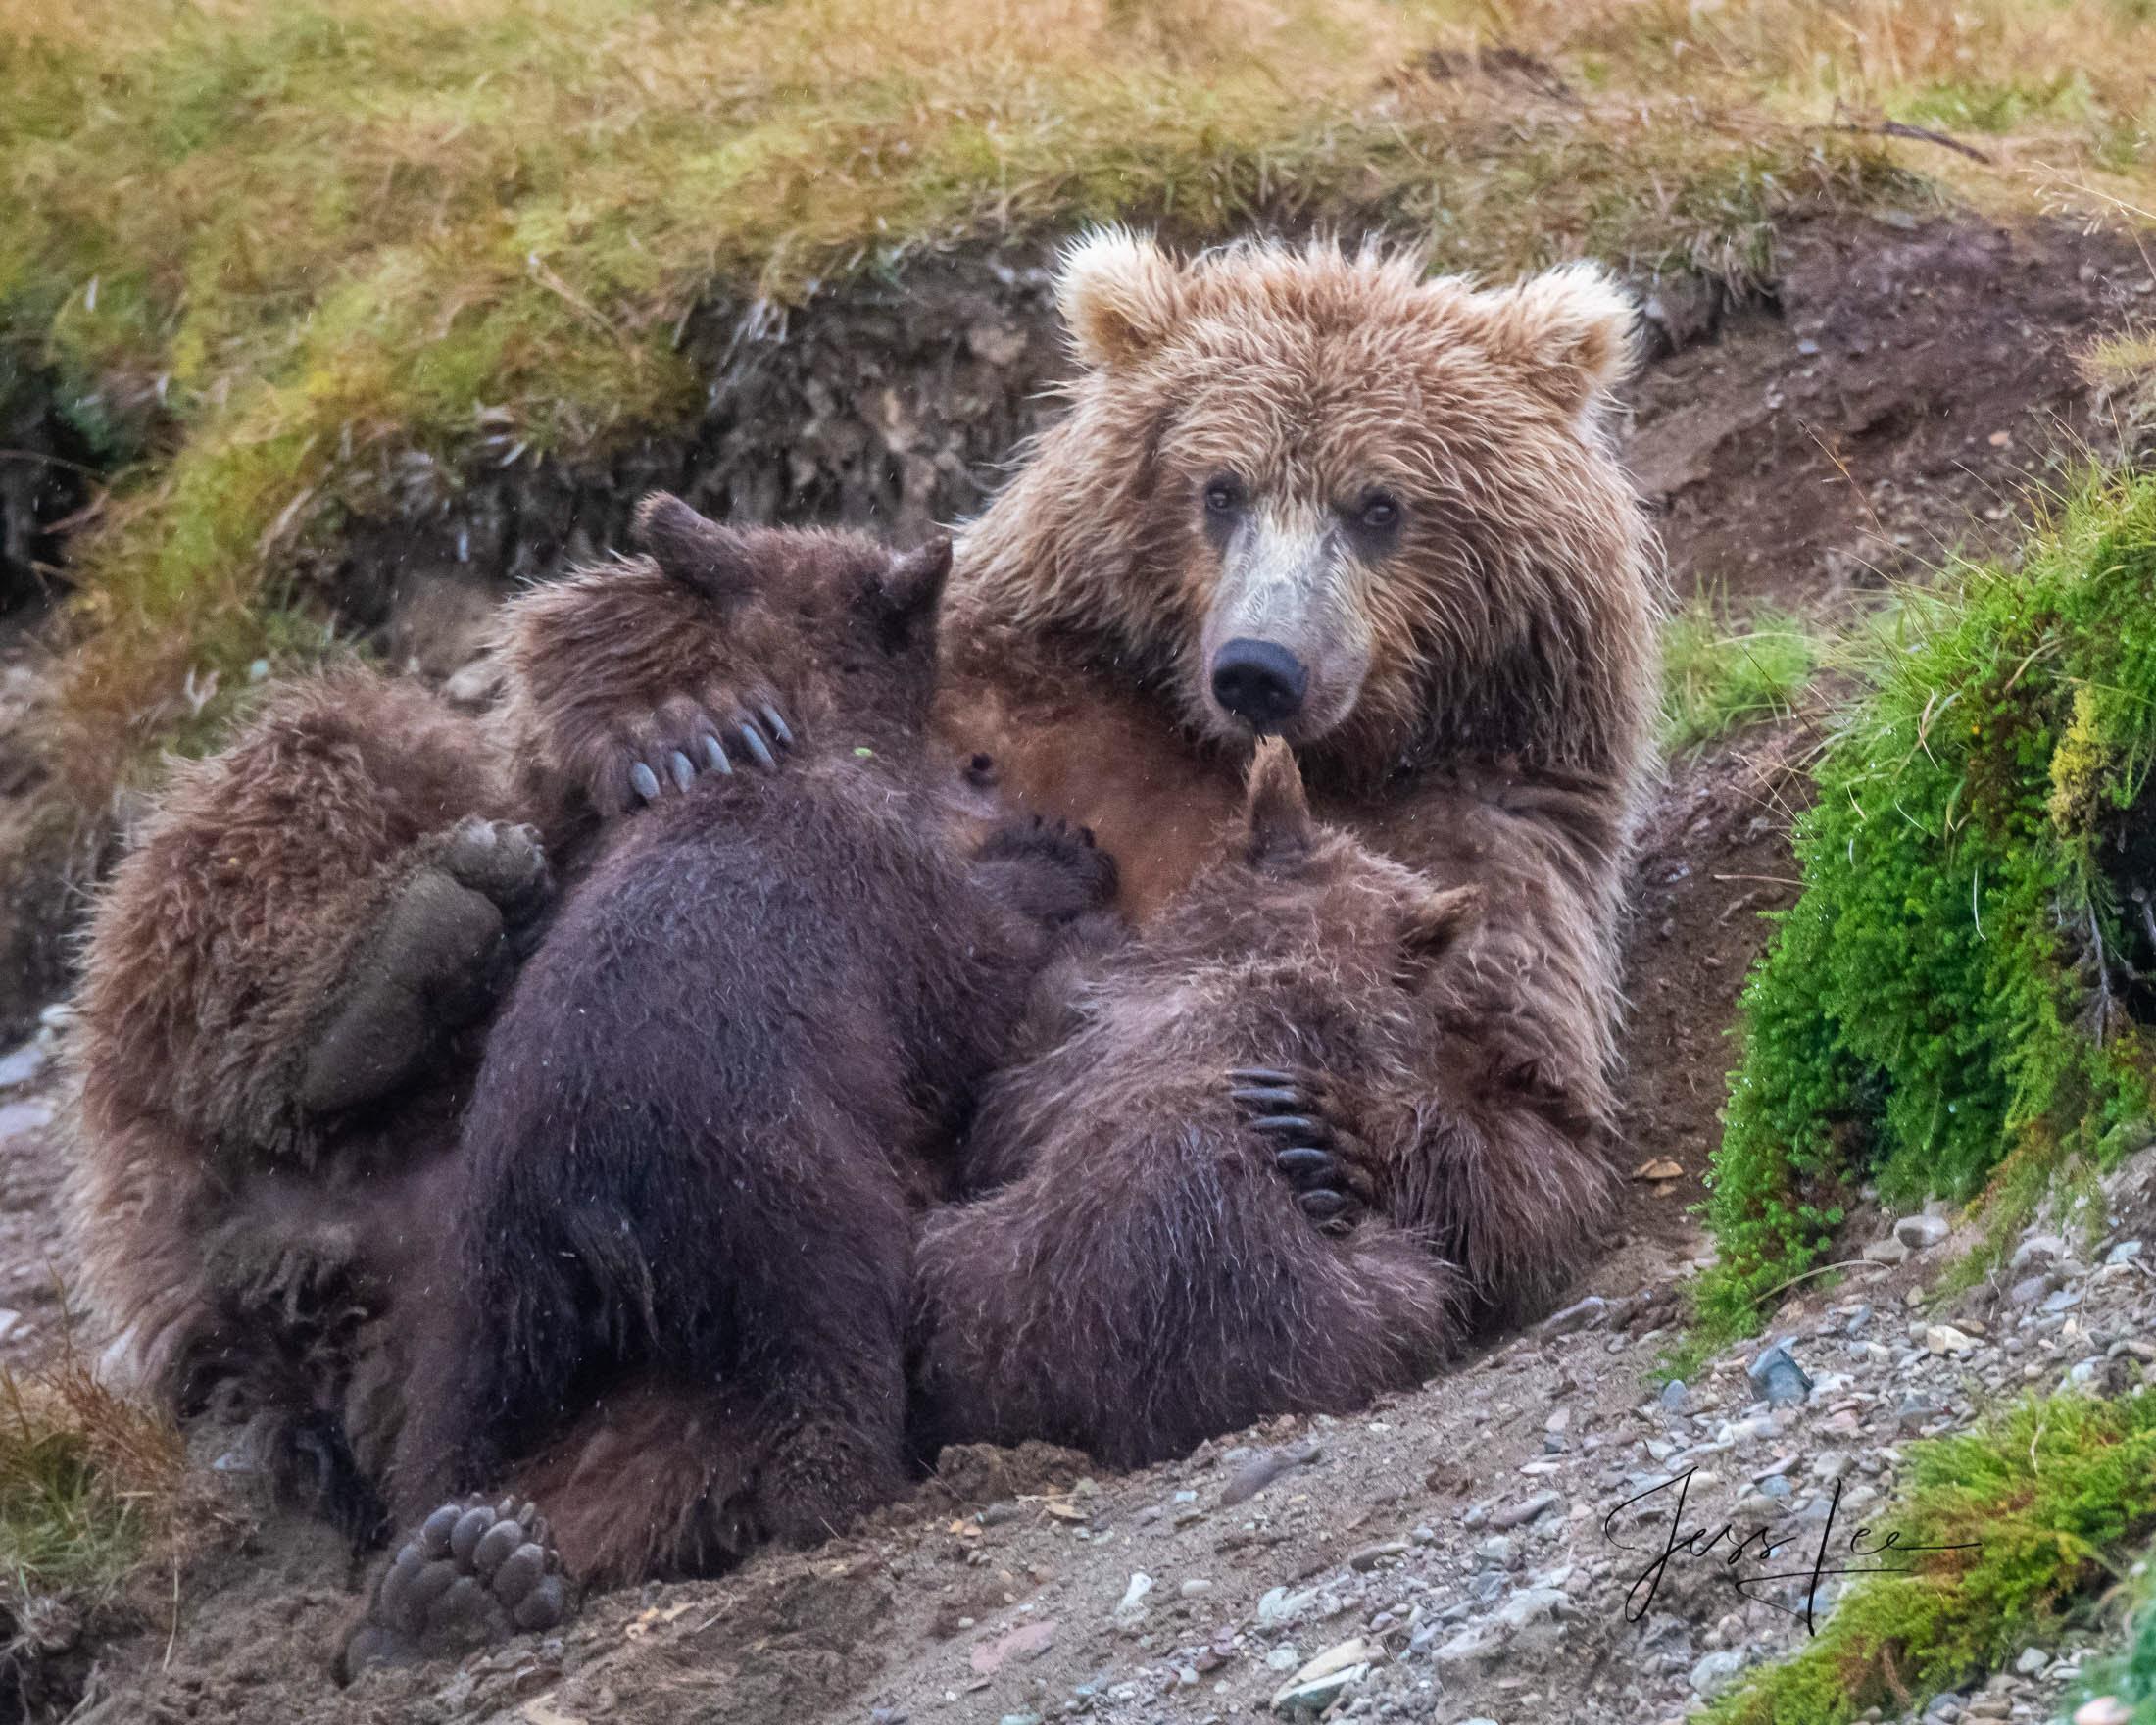 cubs, sow, mother, Katmai, bears, , Bear, grizzle, fishing, salmon, Grizzly Bear Photograph, Grizzly bear picture, Grizzly bear print, photo